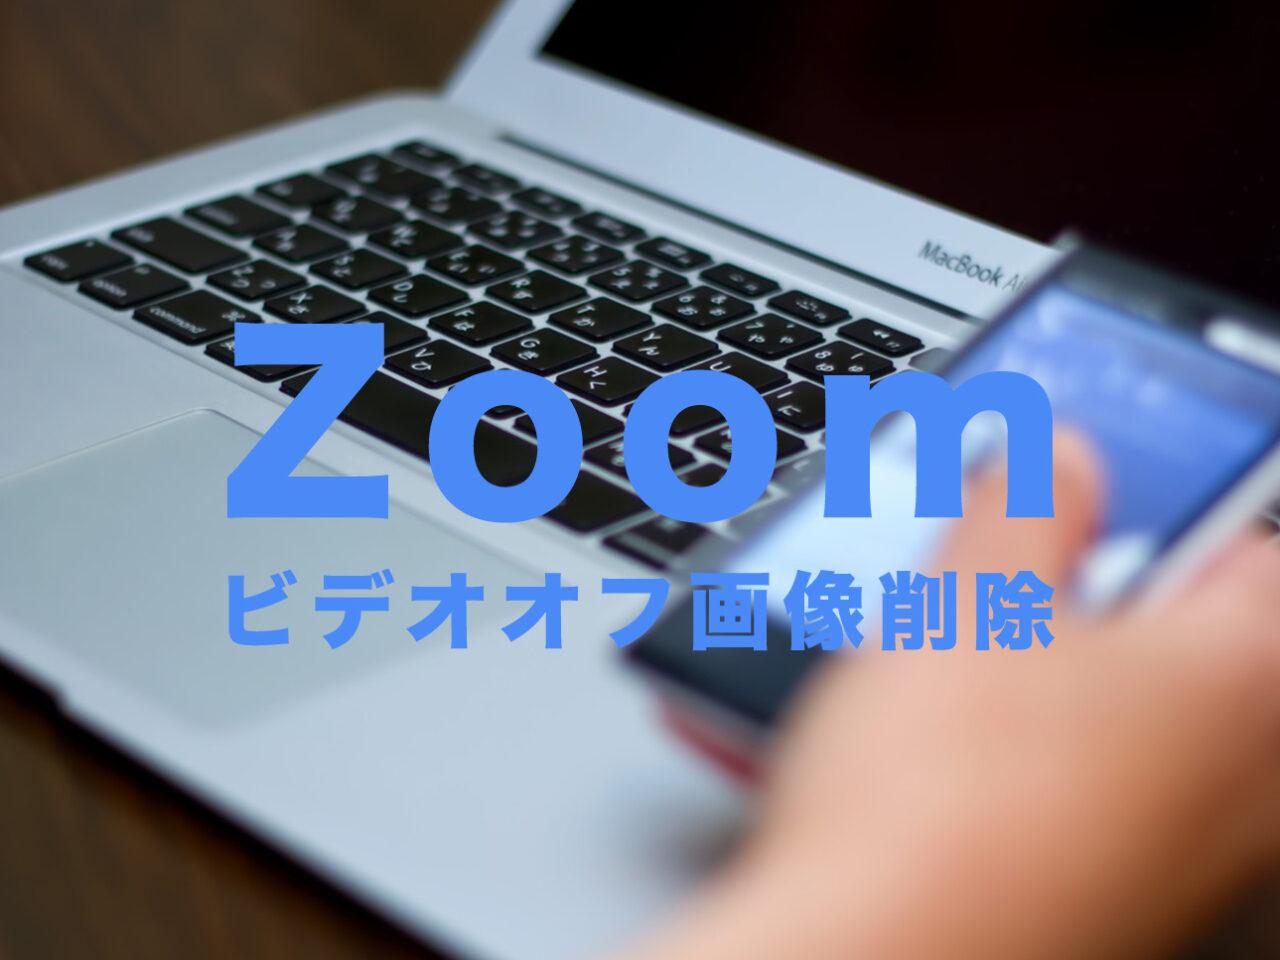 Zoom(ズーム)でビデオオフ時の画像を削除する方法は?のサムネイル画像